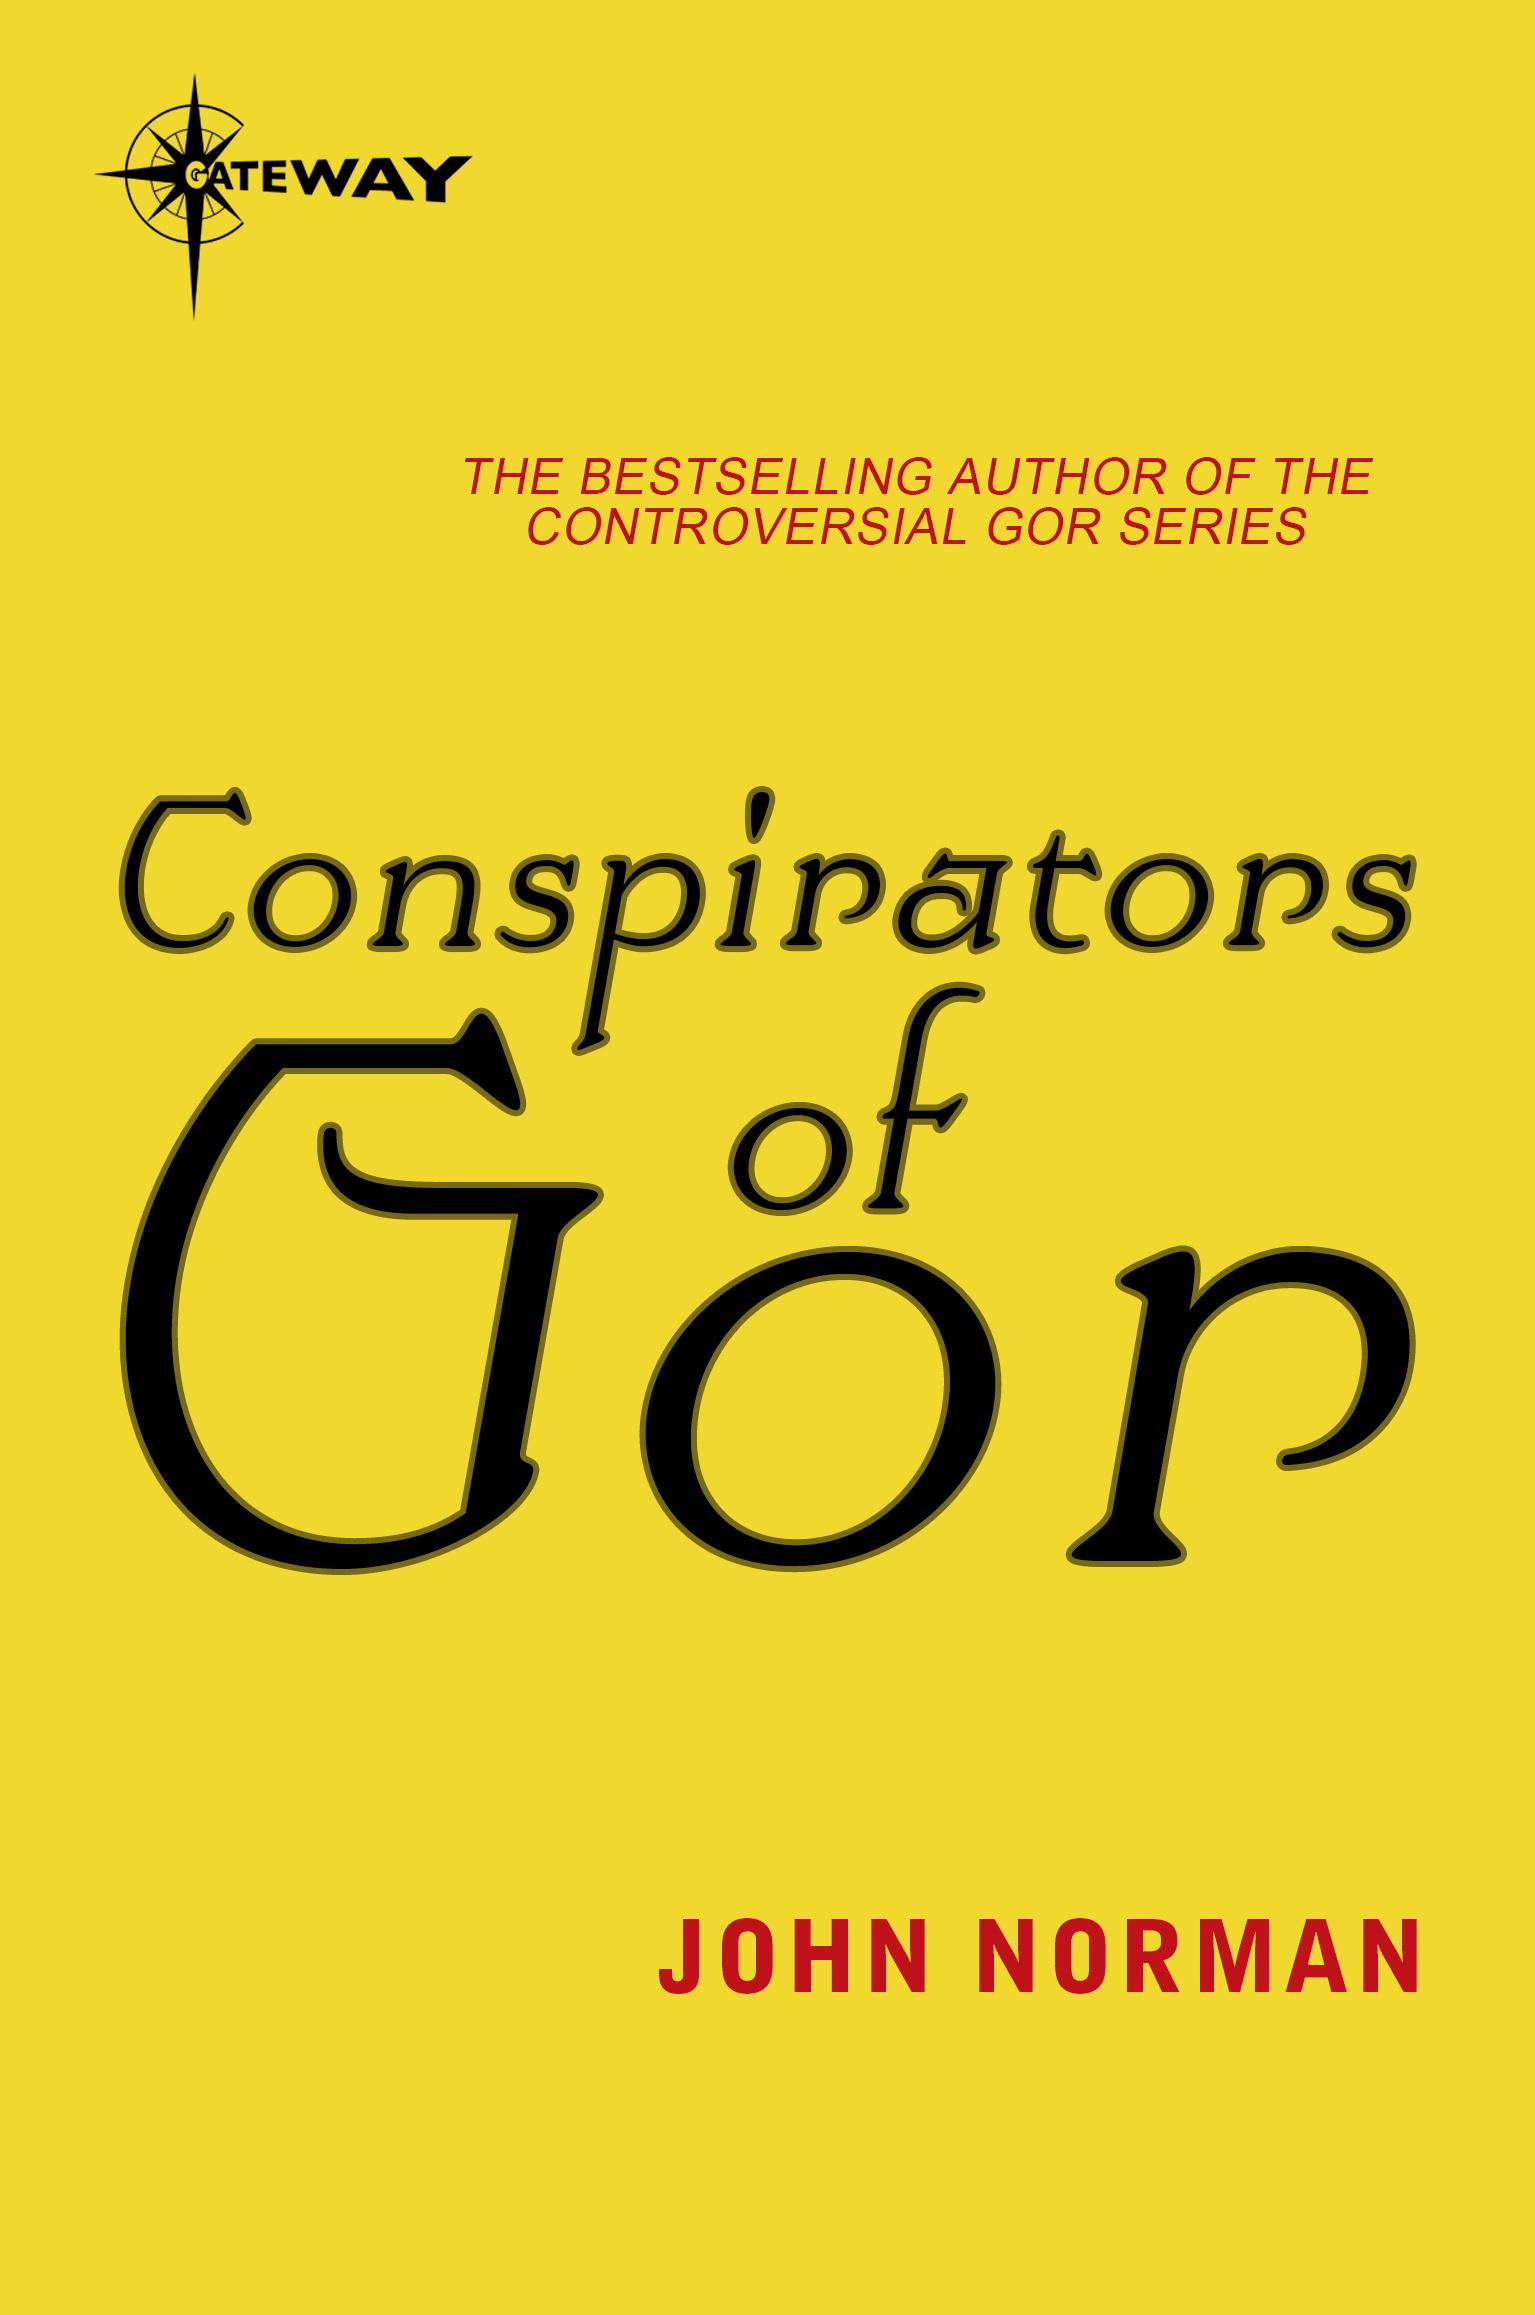 Conspirators Of Gor Gor Book 31 By John Norman Books Hachette